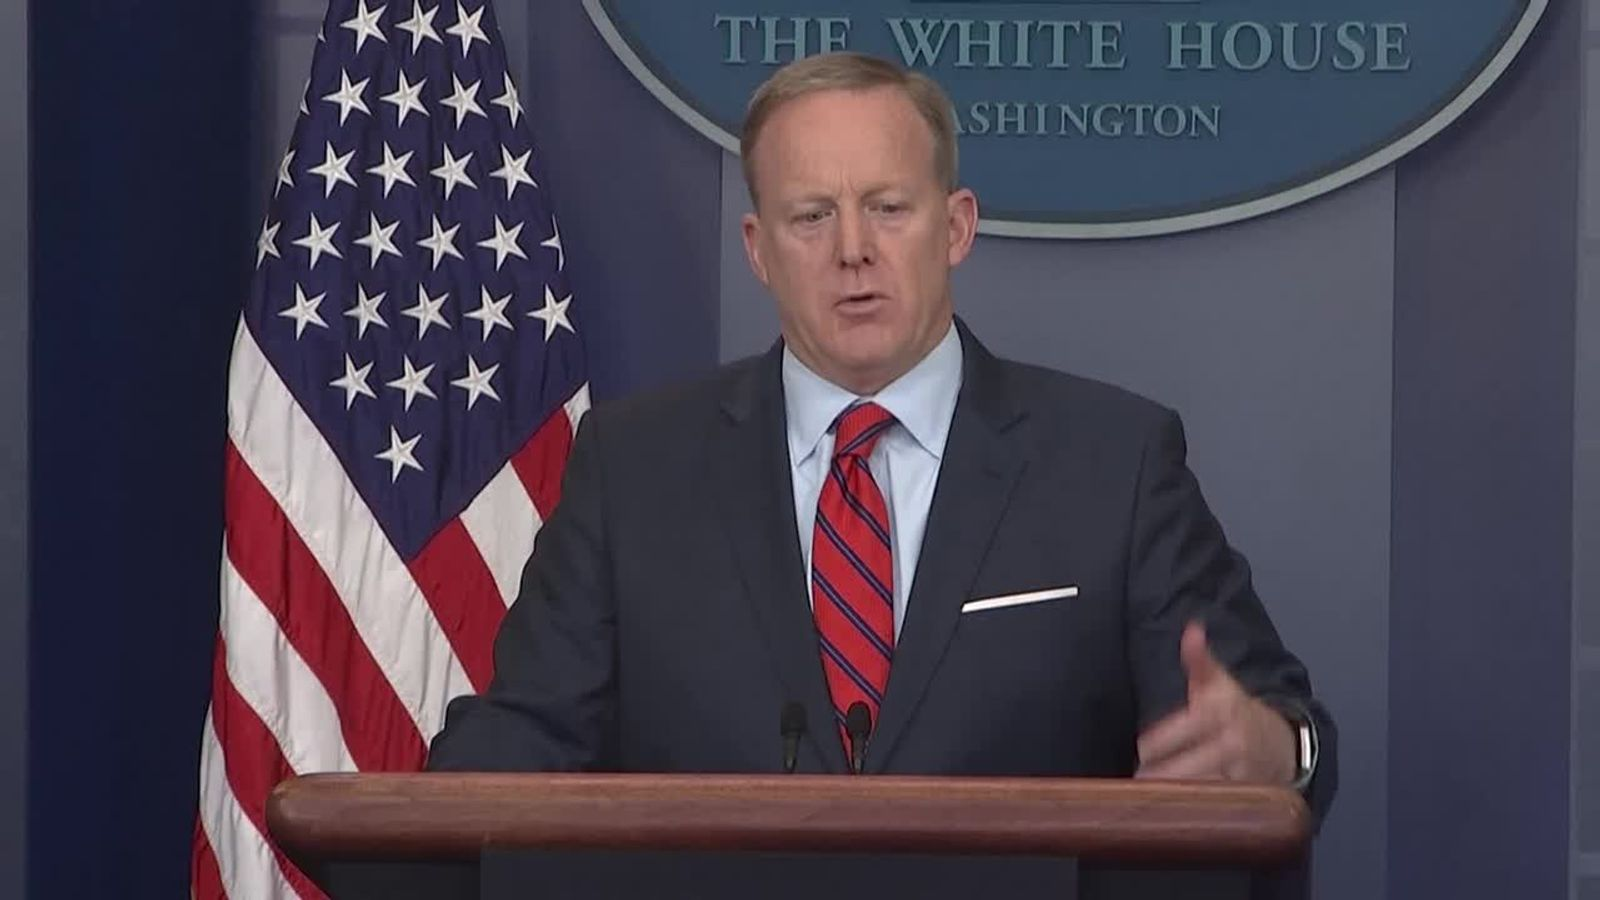 Sean Spicer's Hitler Gaffe Gets 'Veep' Treatment